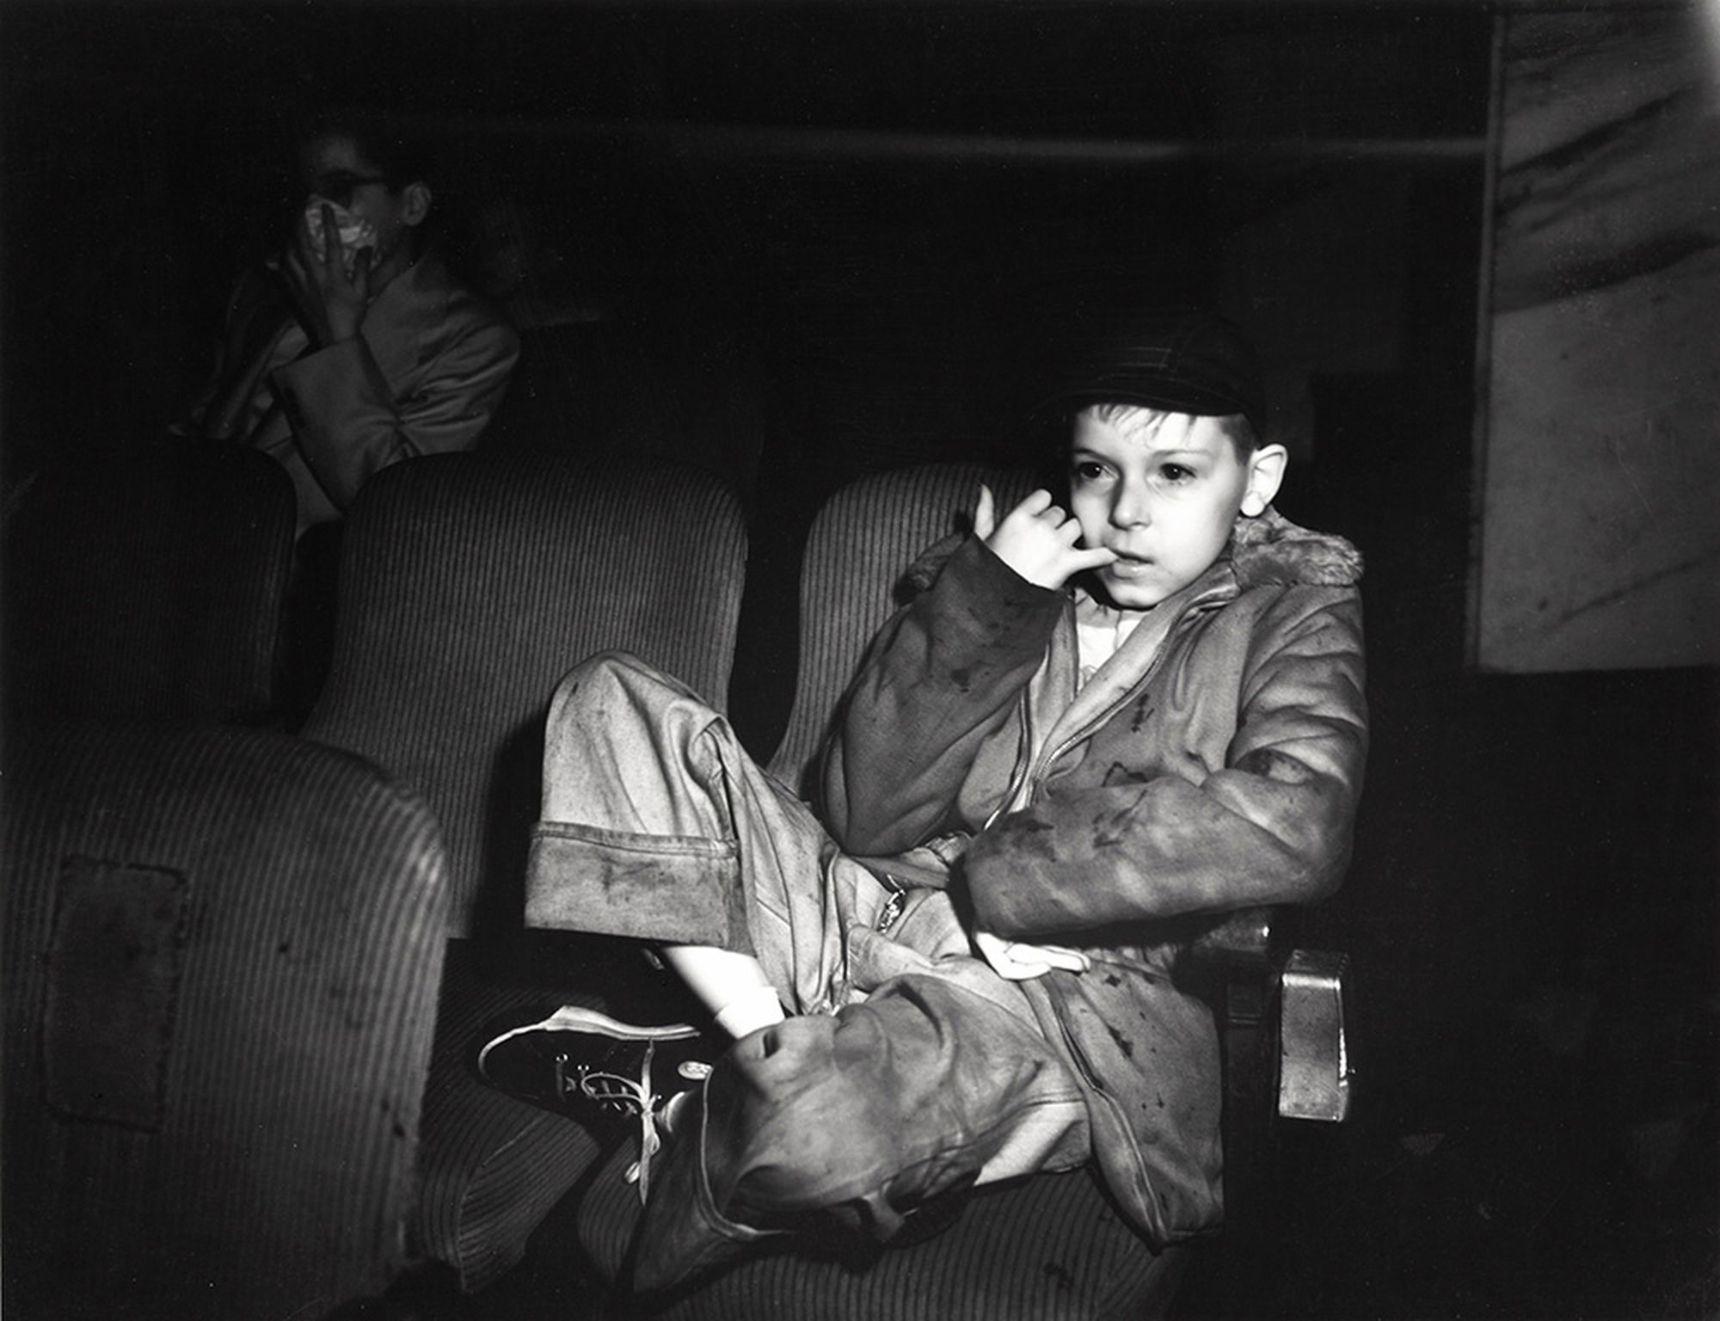 boy watching movie in the cinema